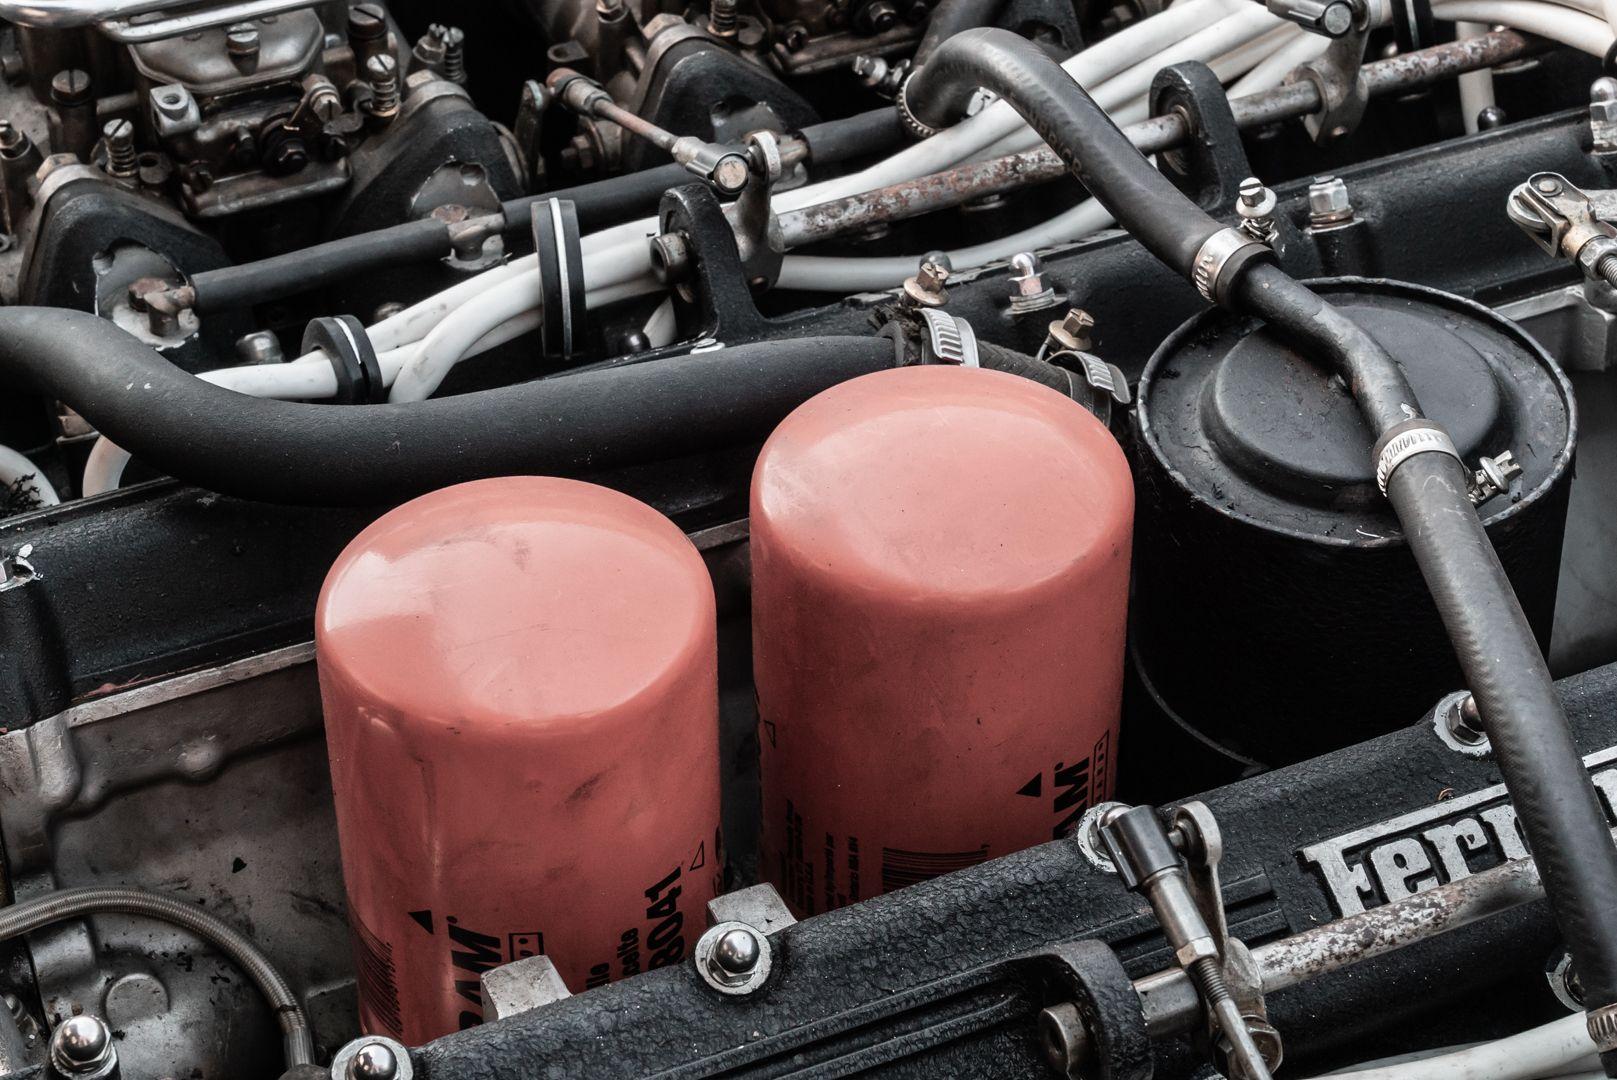 1973 Ferrari 365 GT4 2+2 81348